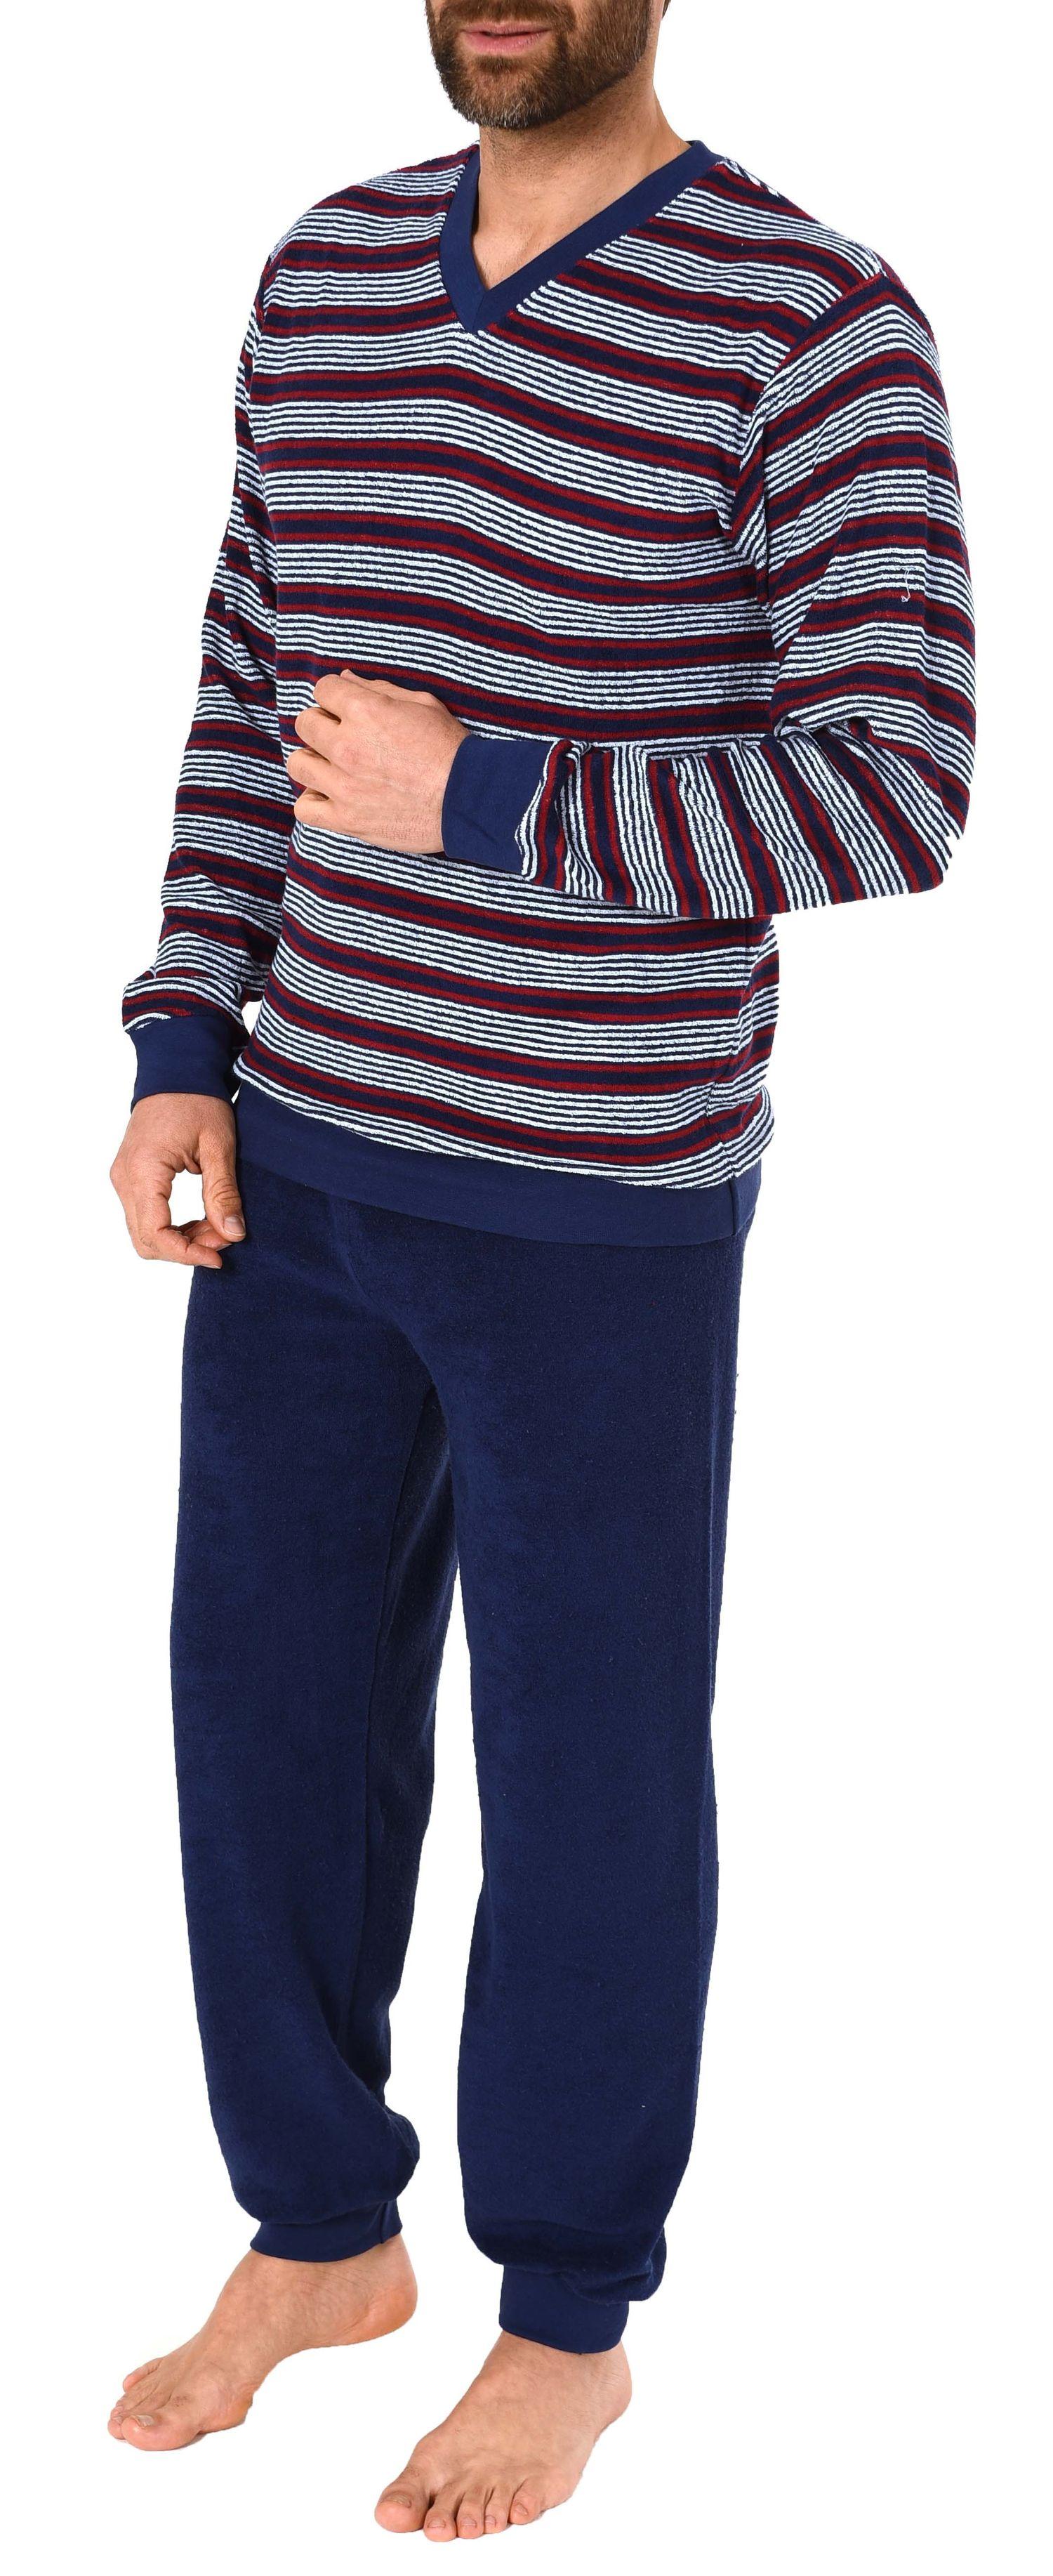 Edler Herren Frottee Pyjama lang mit Bündchen in Streifenoptik – 271 101 93 003 – Bild 3